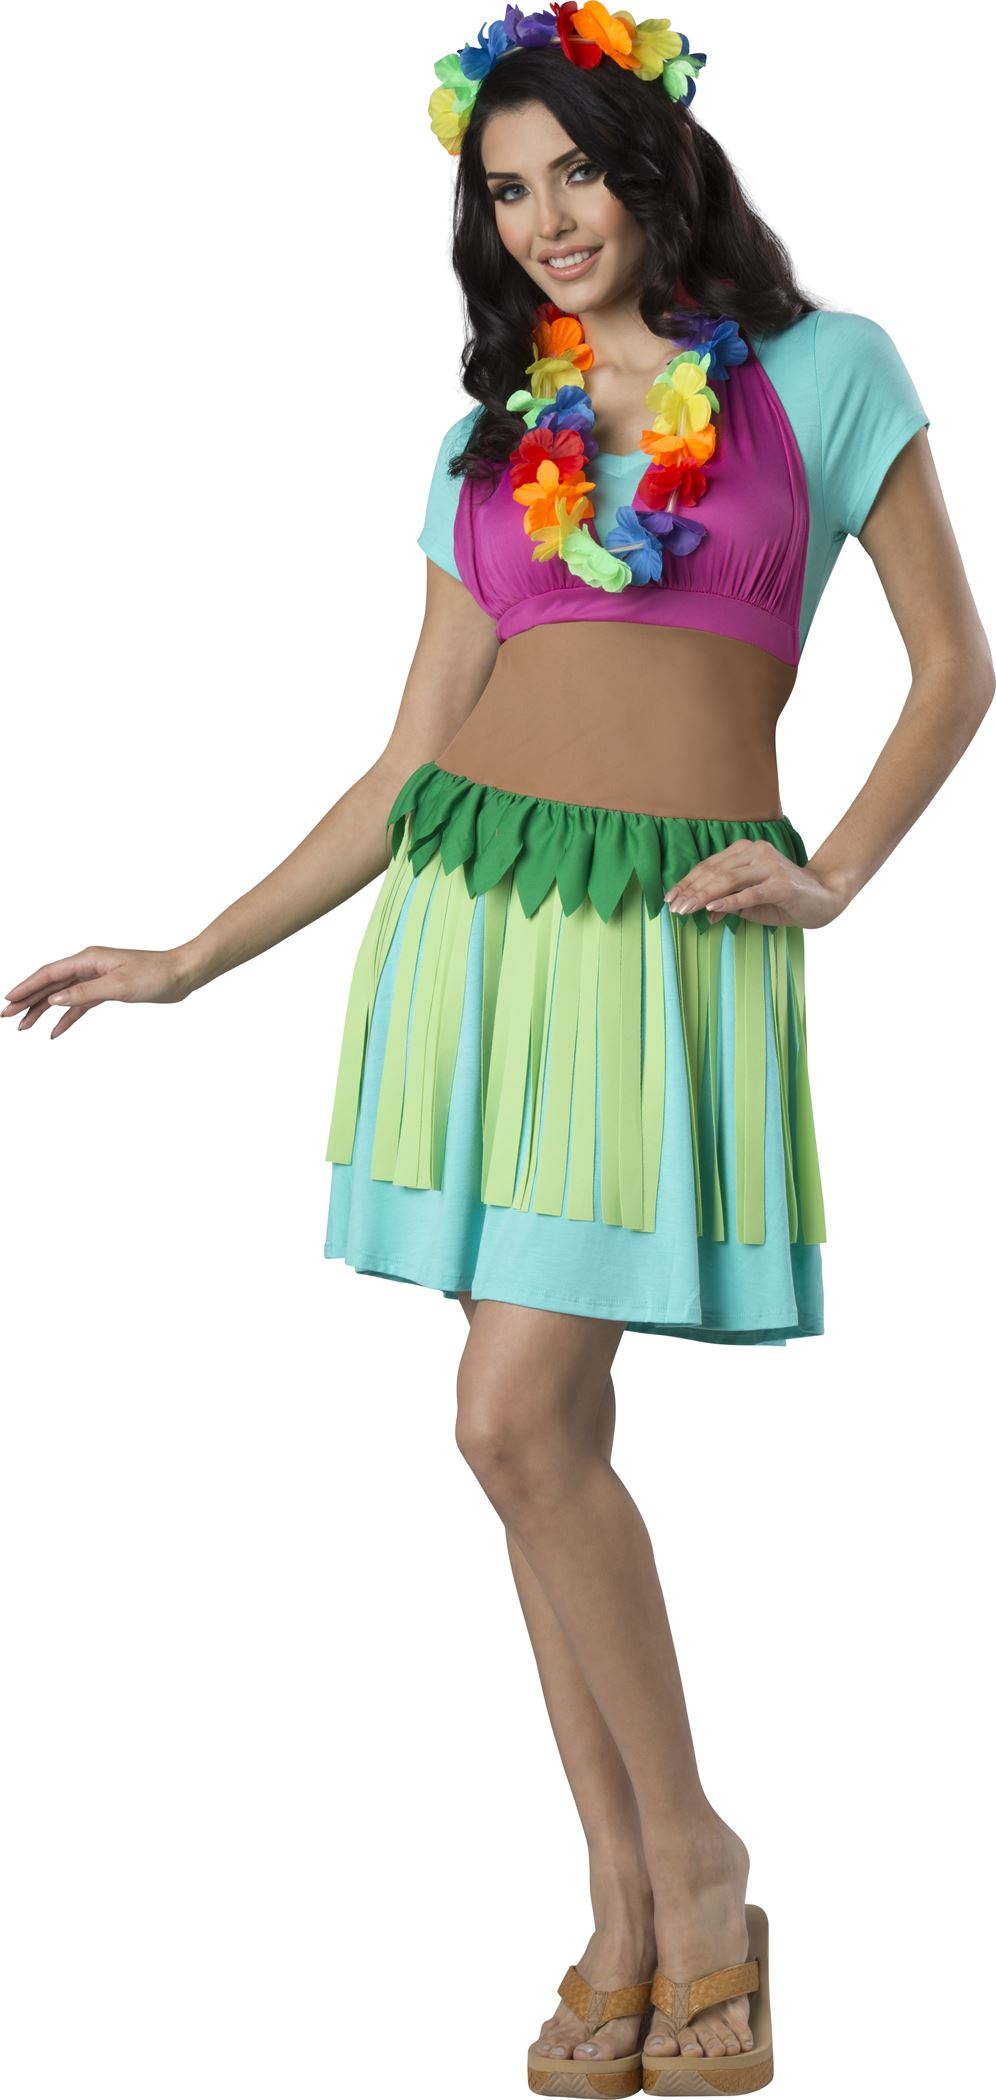 Adult Hawaiian Hula Apron Costume | $24.99 | The Costume Land